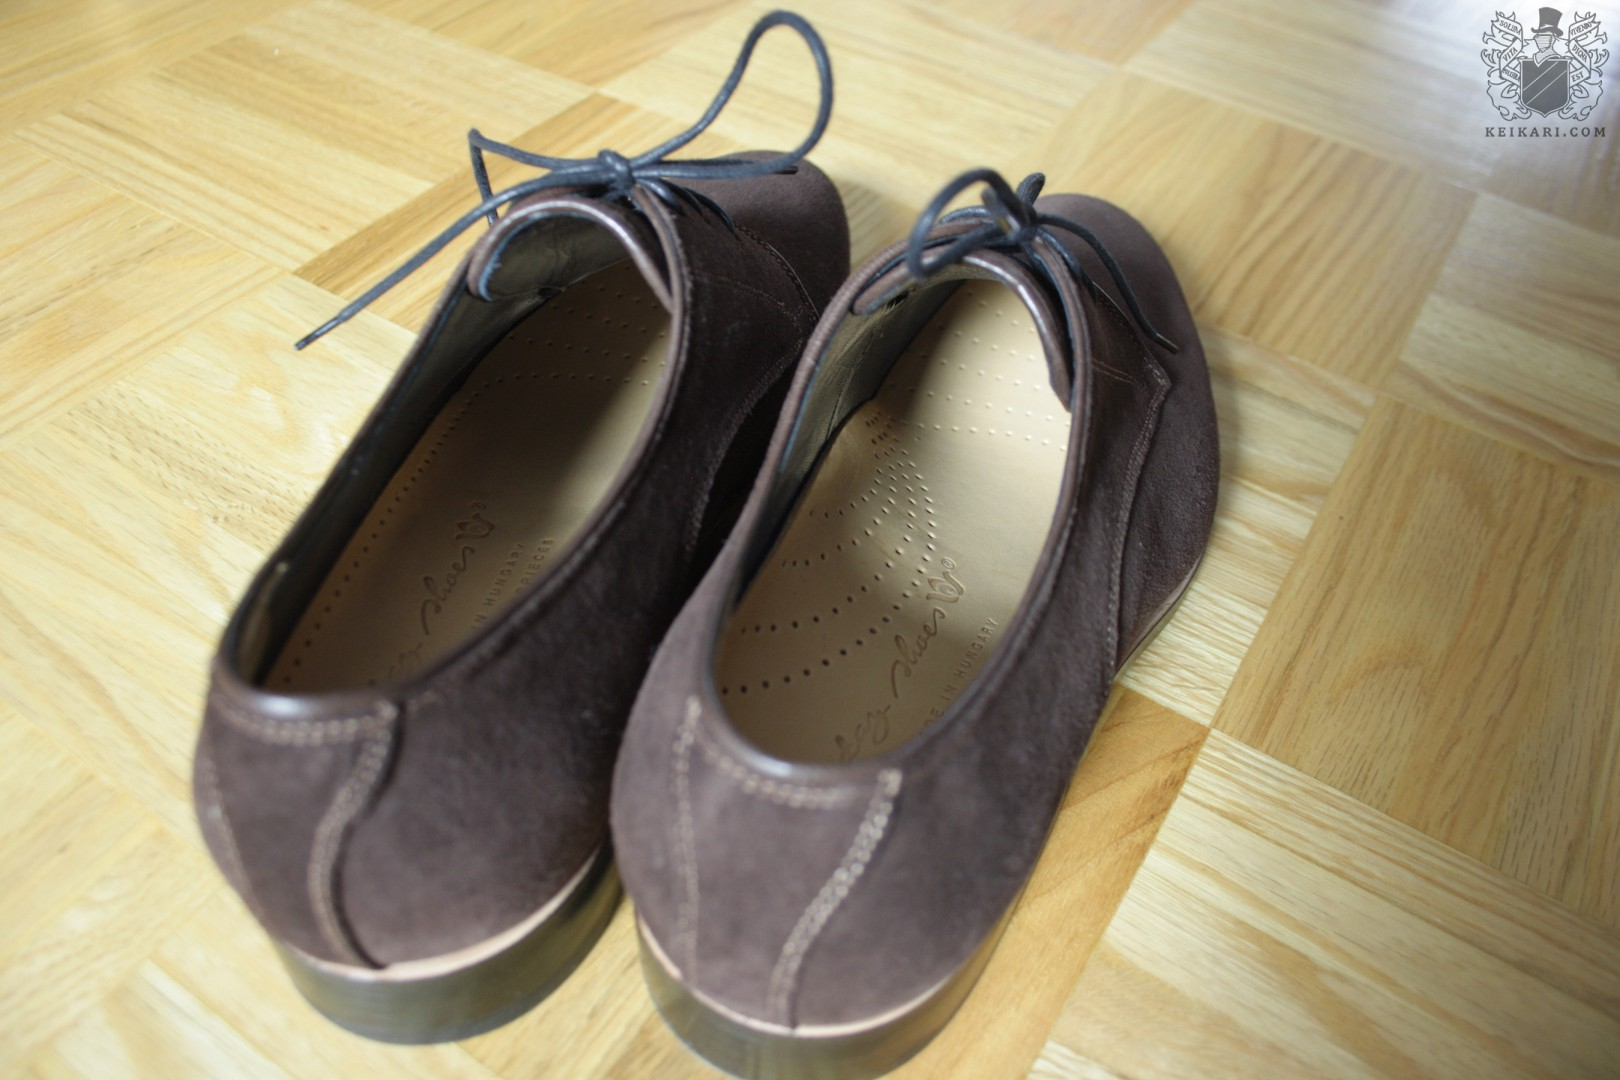 Anatomy_of_Buday_shoes_at_Keikari_dot_com14.jpg